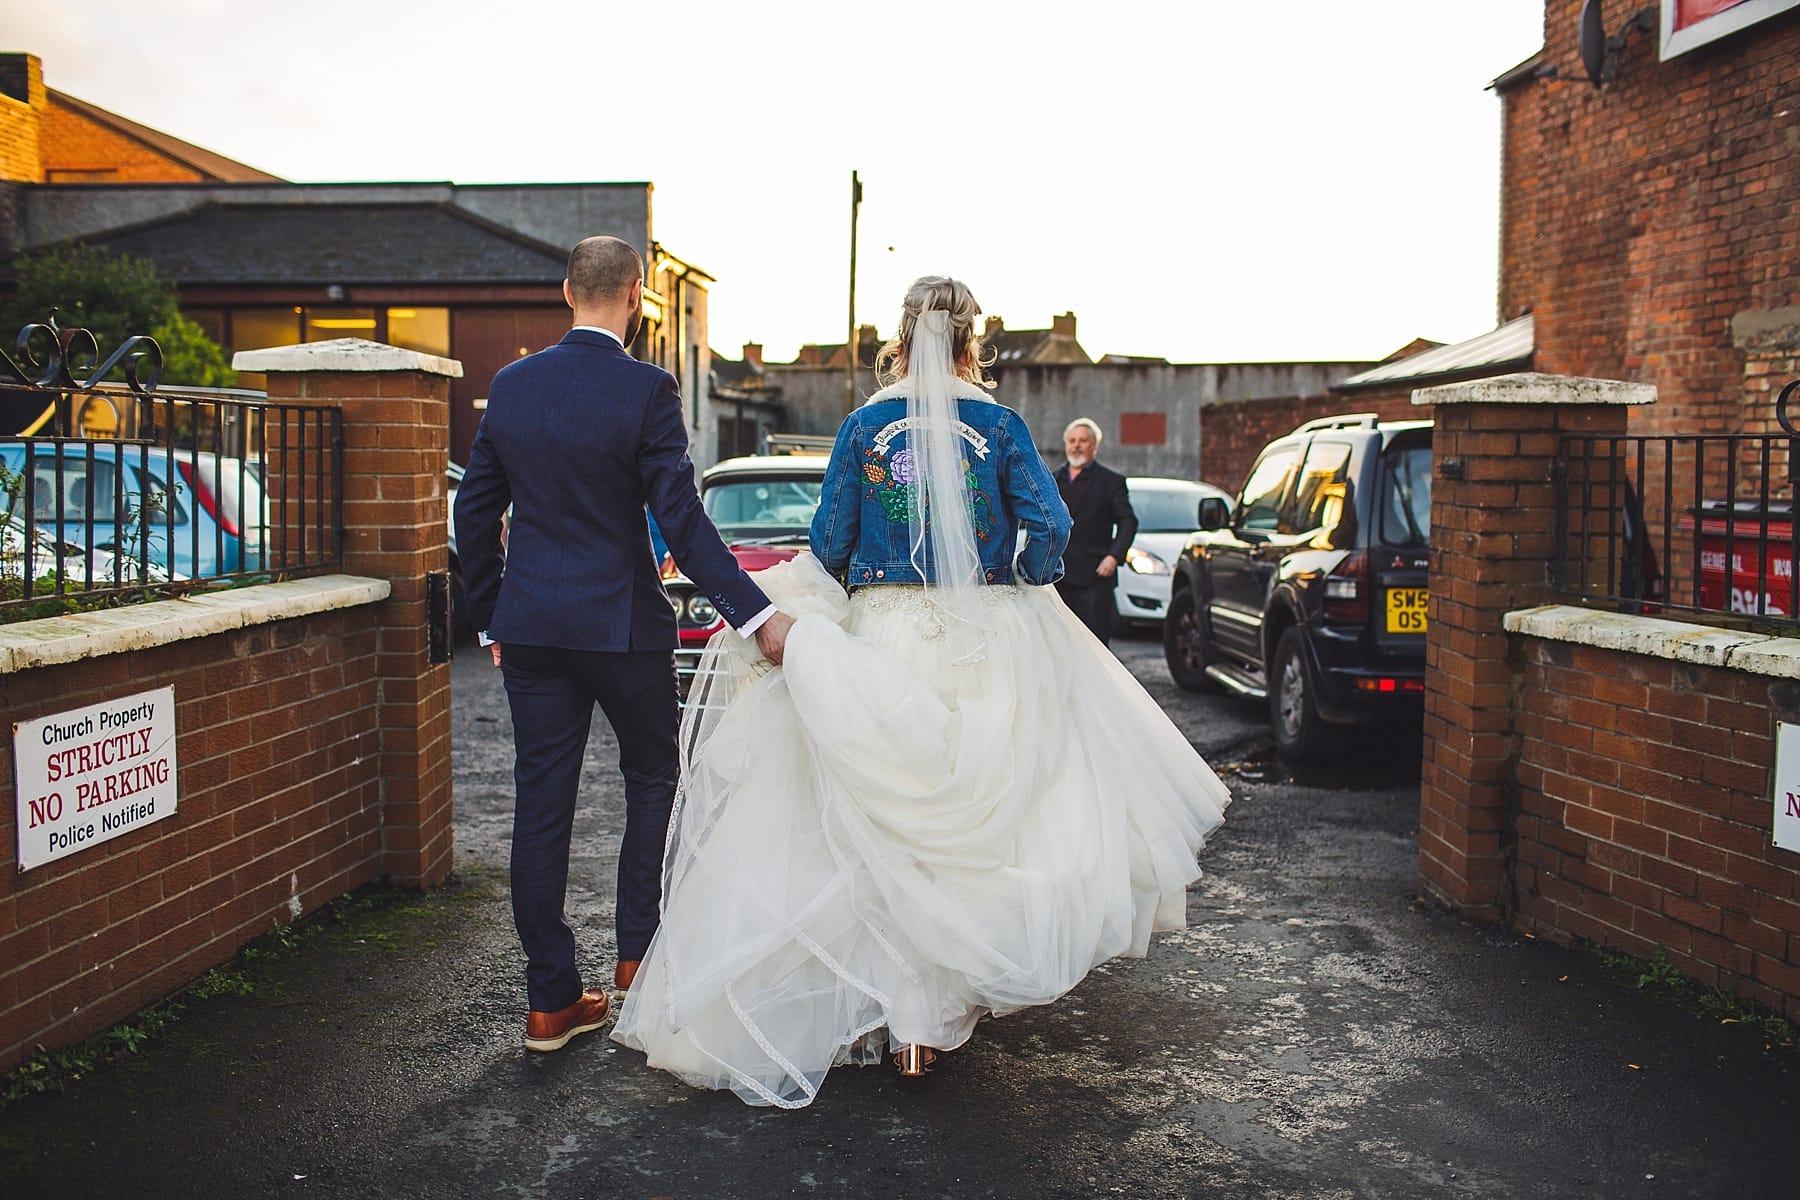 belfast city wedding,AMPM cabaret supper club,winter wedding,belfast christmas market wedding,belfast wedding photographers,the treehouse belfast,